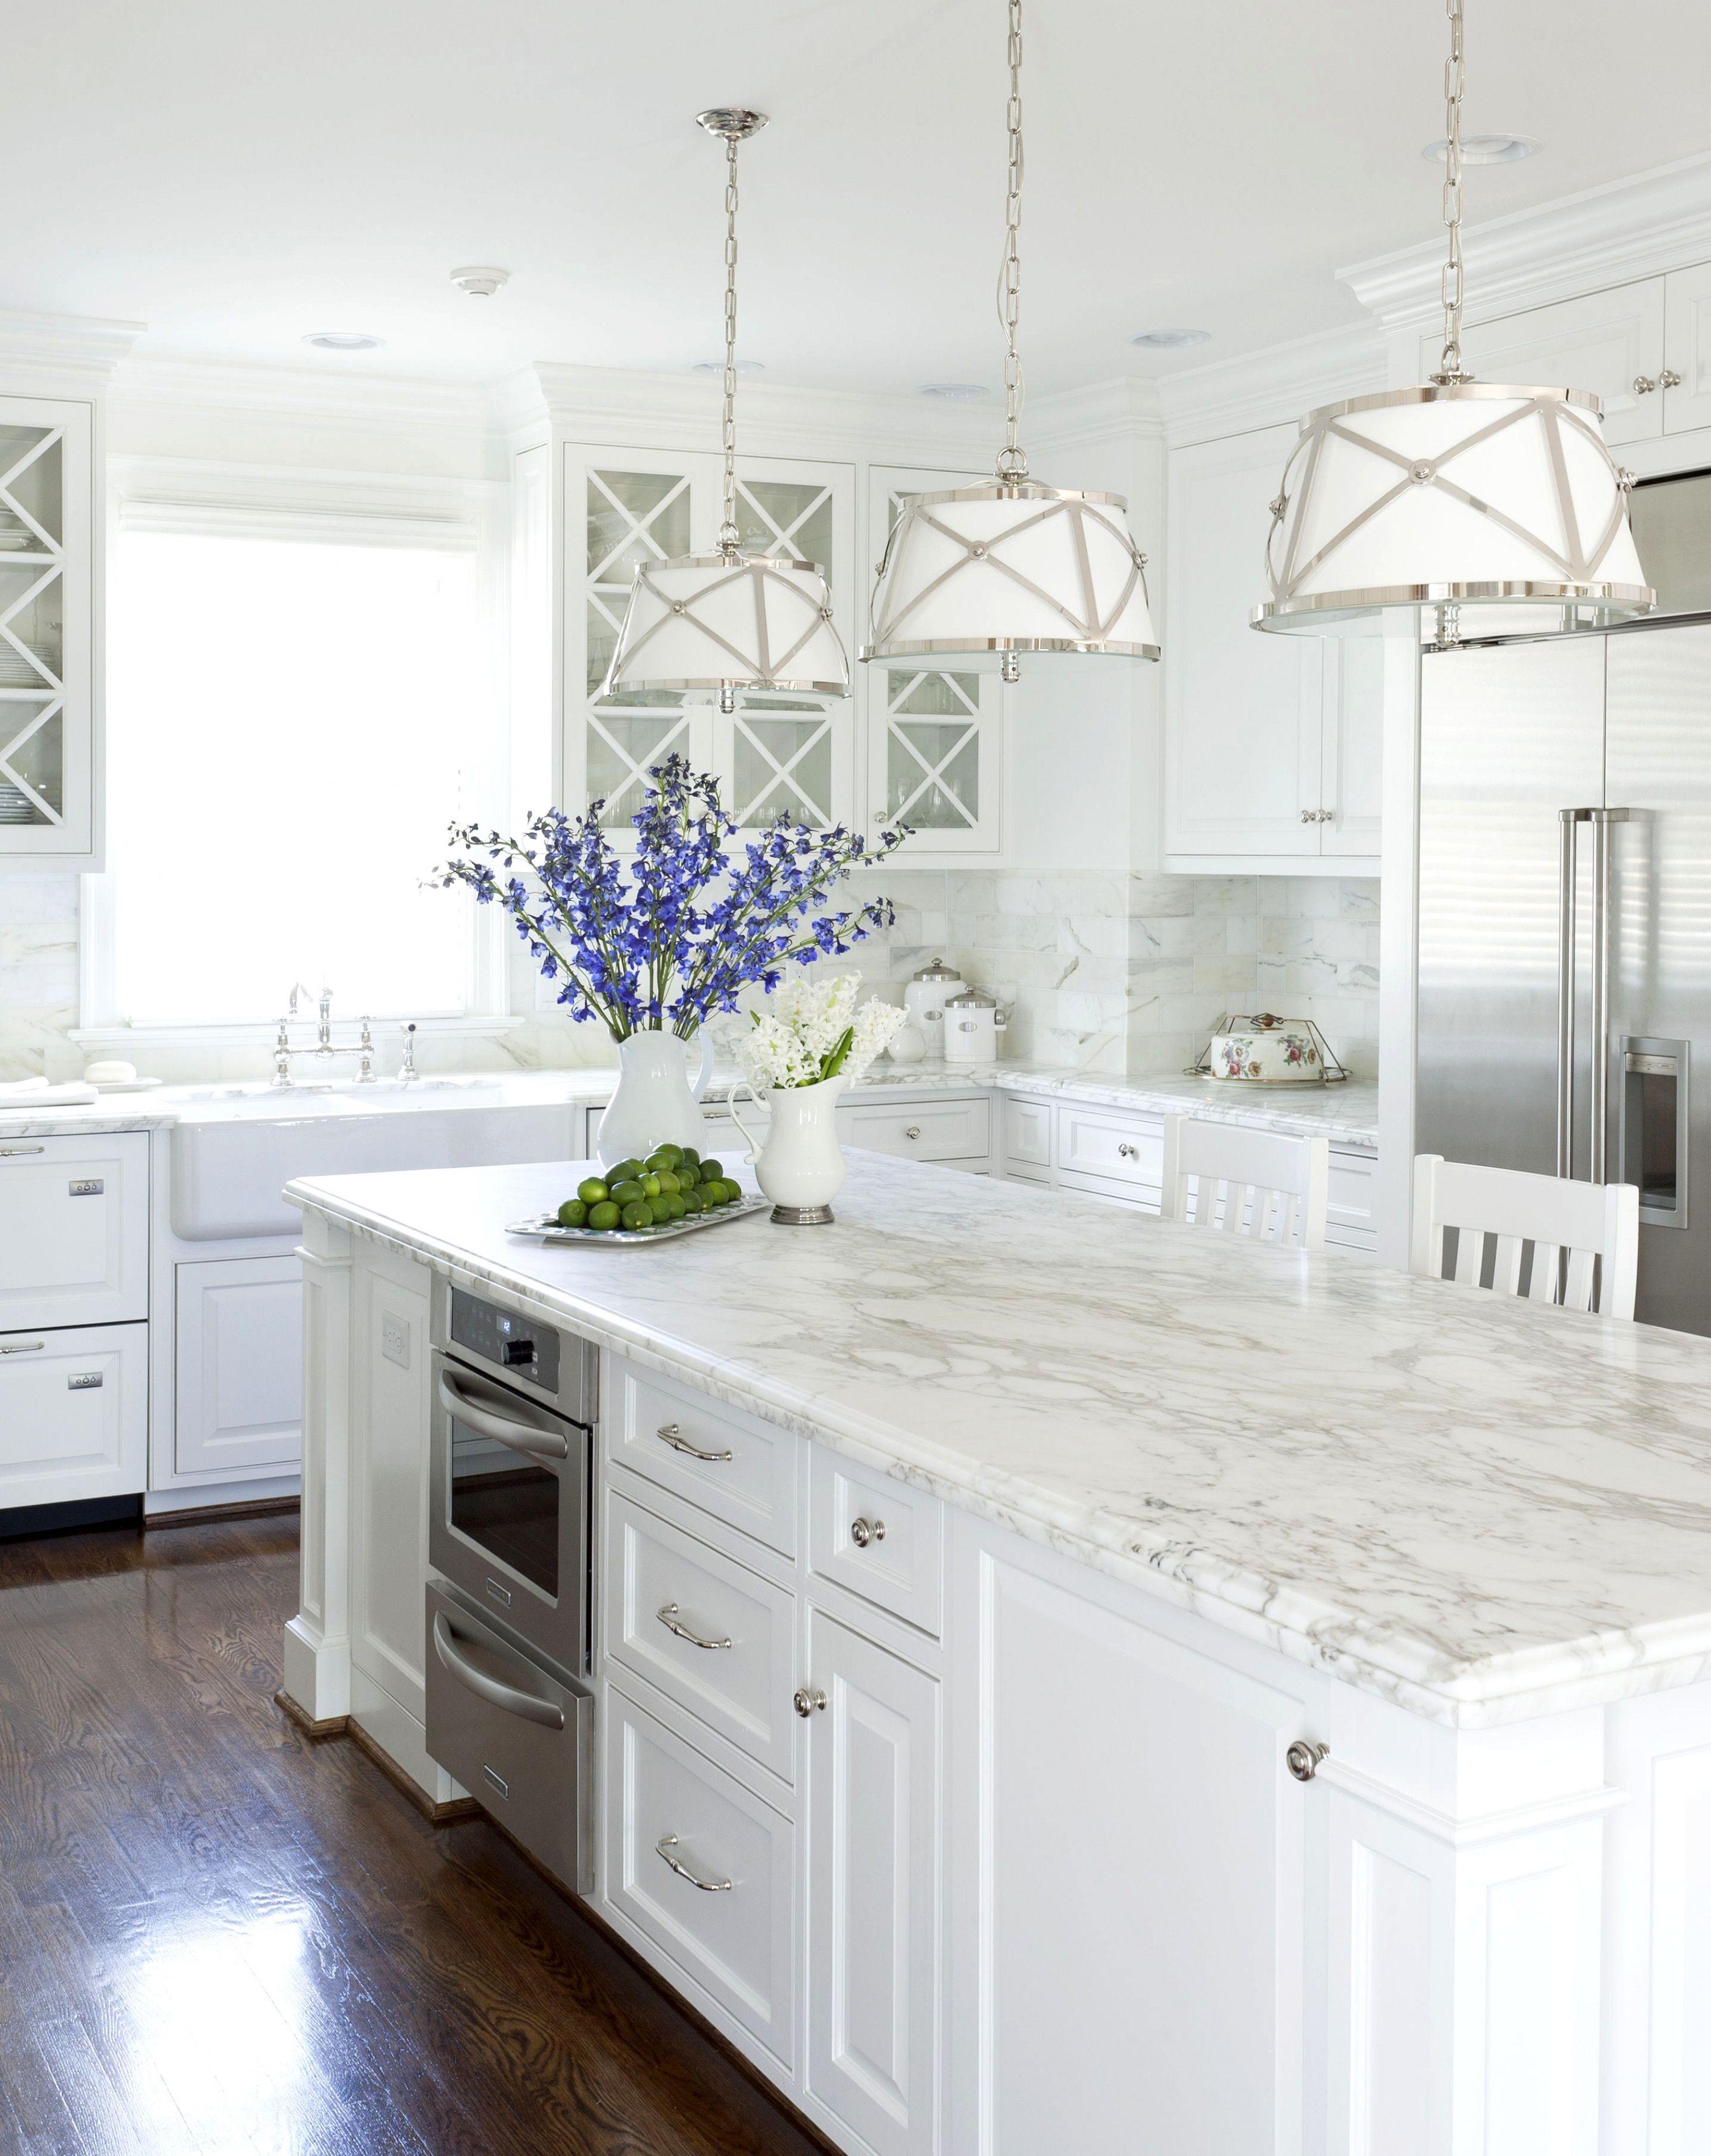 white kitchen all it s missing is the cobalt blue accents kitchenremodelideas white kitchen on kitchen decor blue id=76857